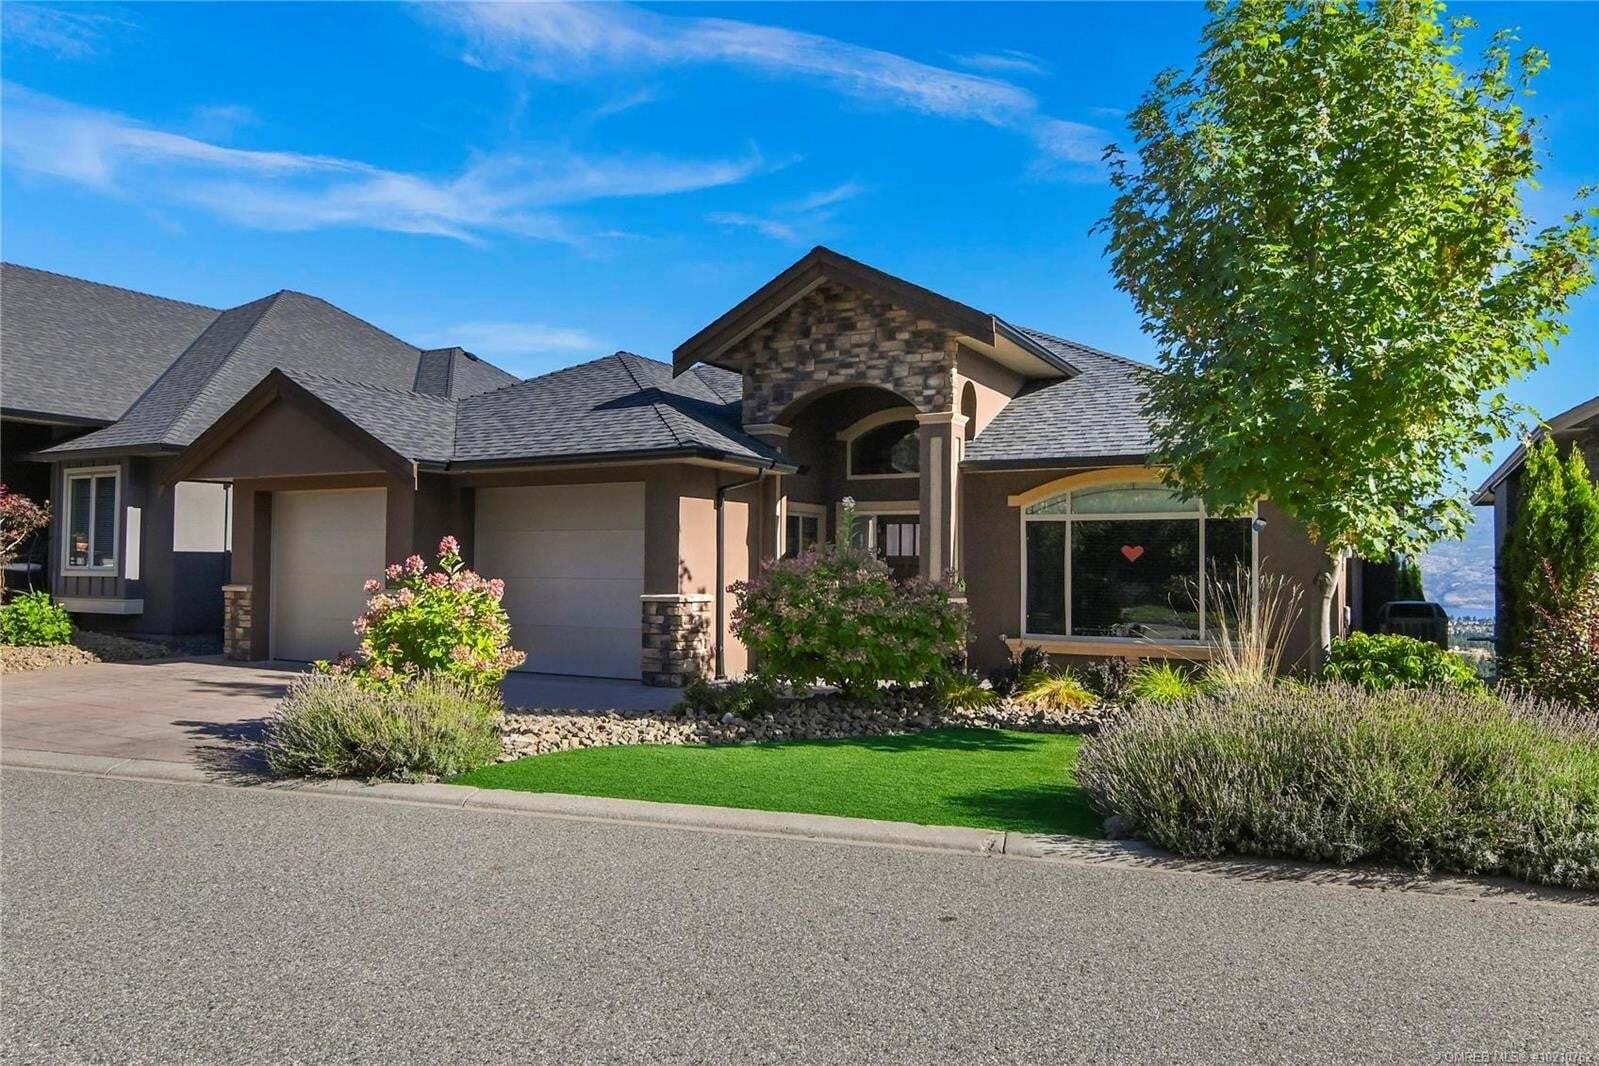 House for sale at 2534 Hedgestone Dr West Kelowna British Columbia - MLS: 10210762